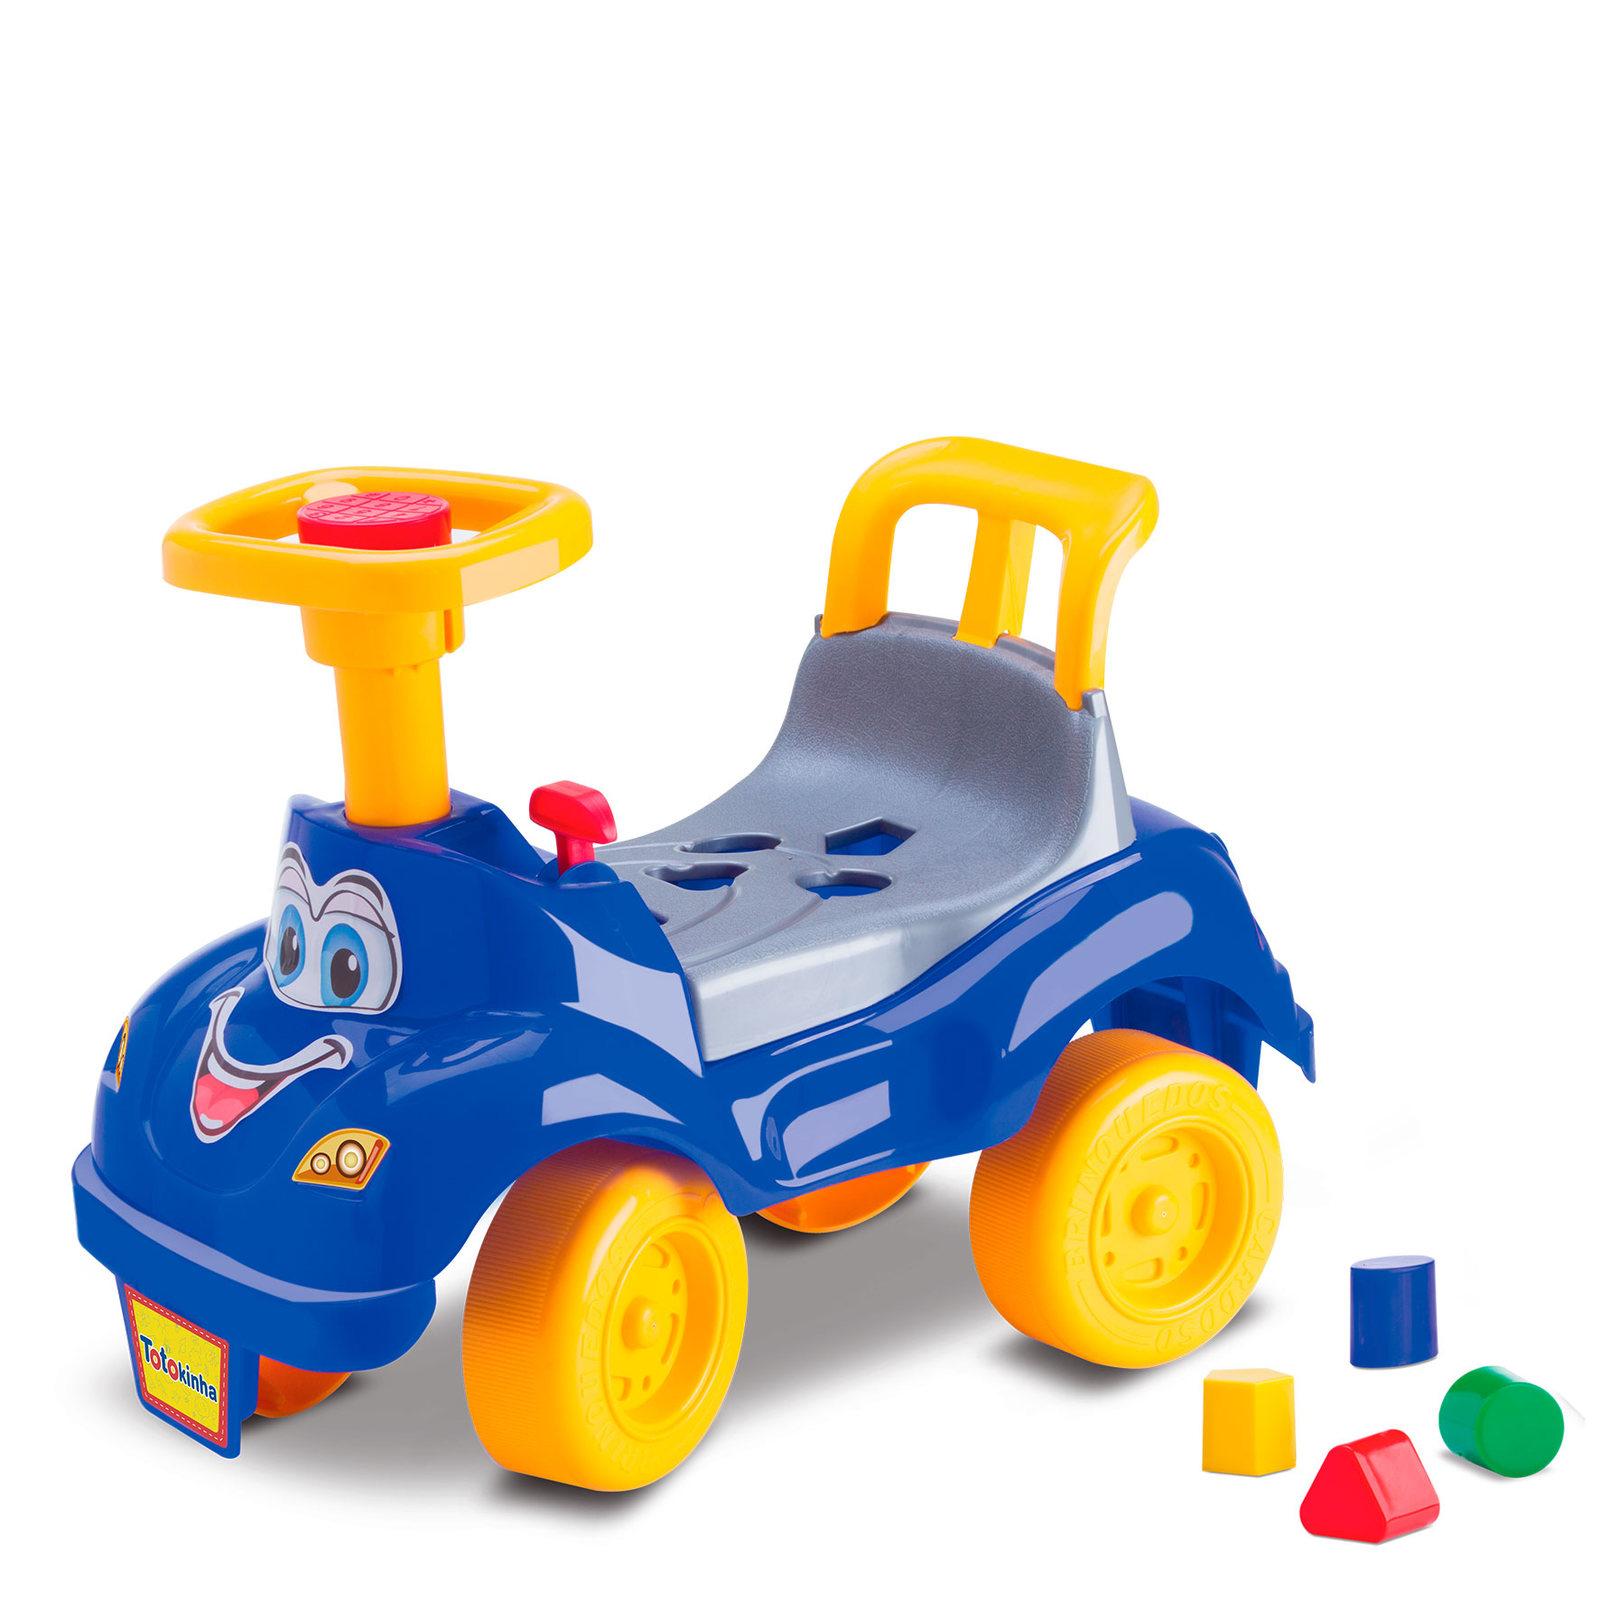 Totokinha Infantil Menino e Menina - Cardoso Toys 300/301